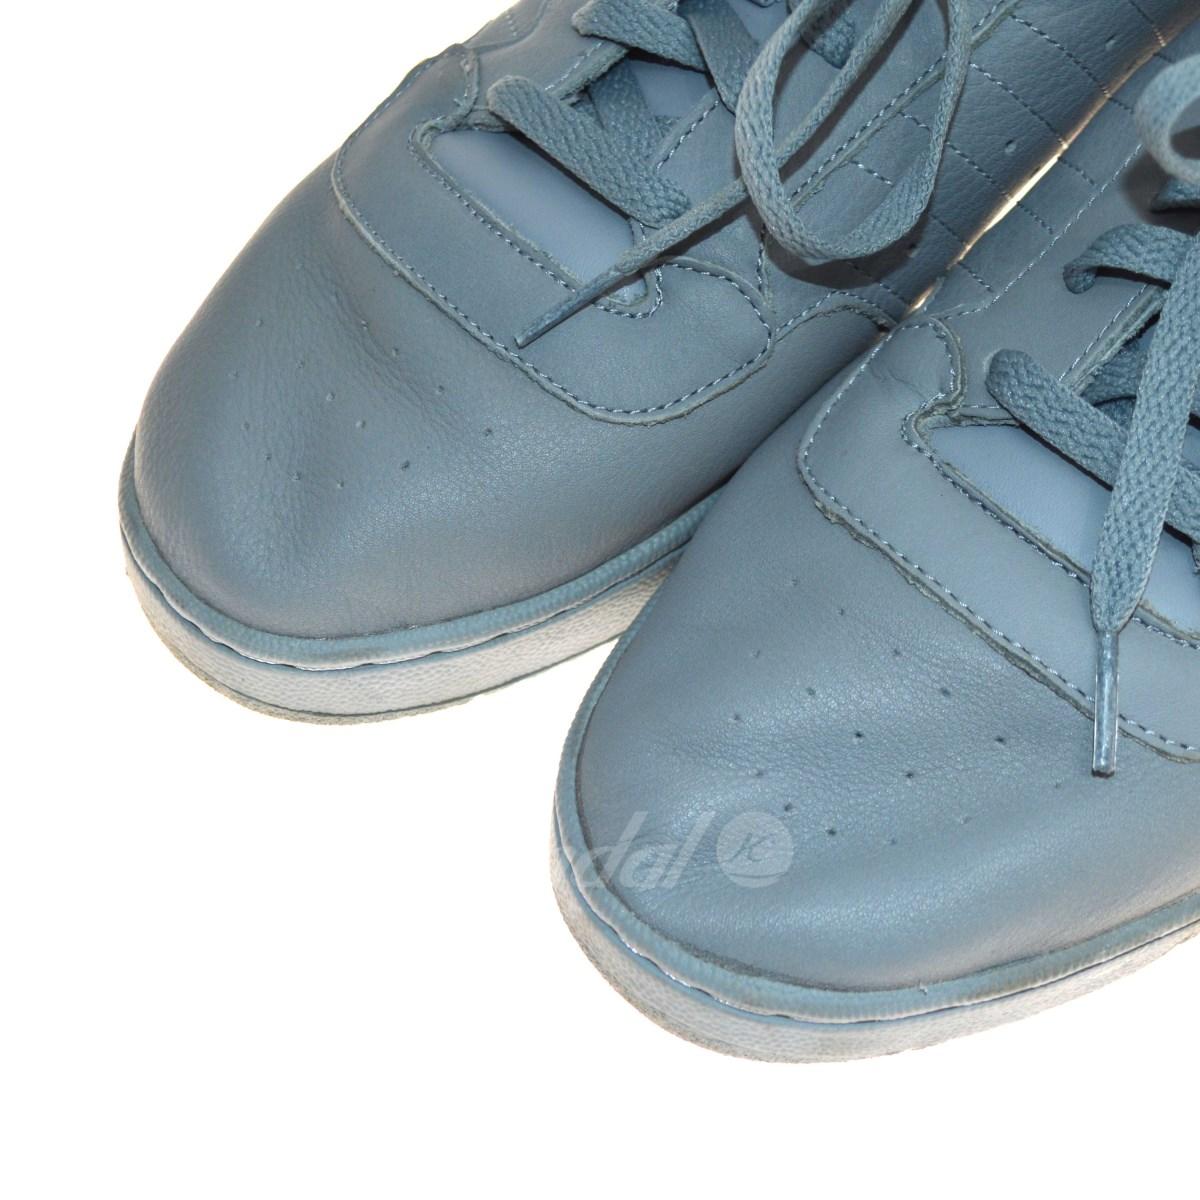 adidas originals YEEZY POWERPHASE sneakers Minamisenba store OPEN memory sale